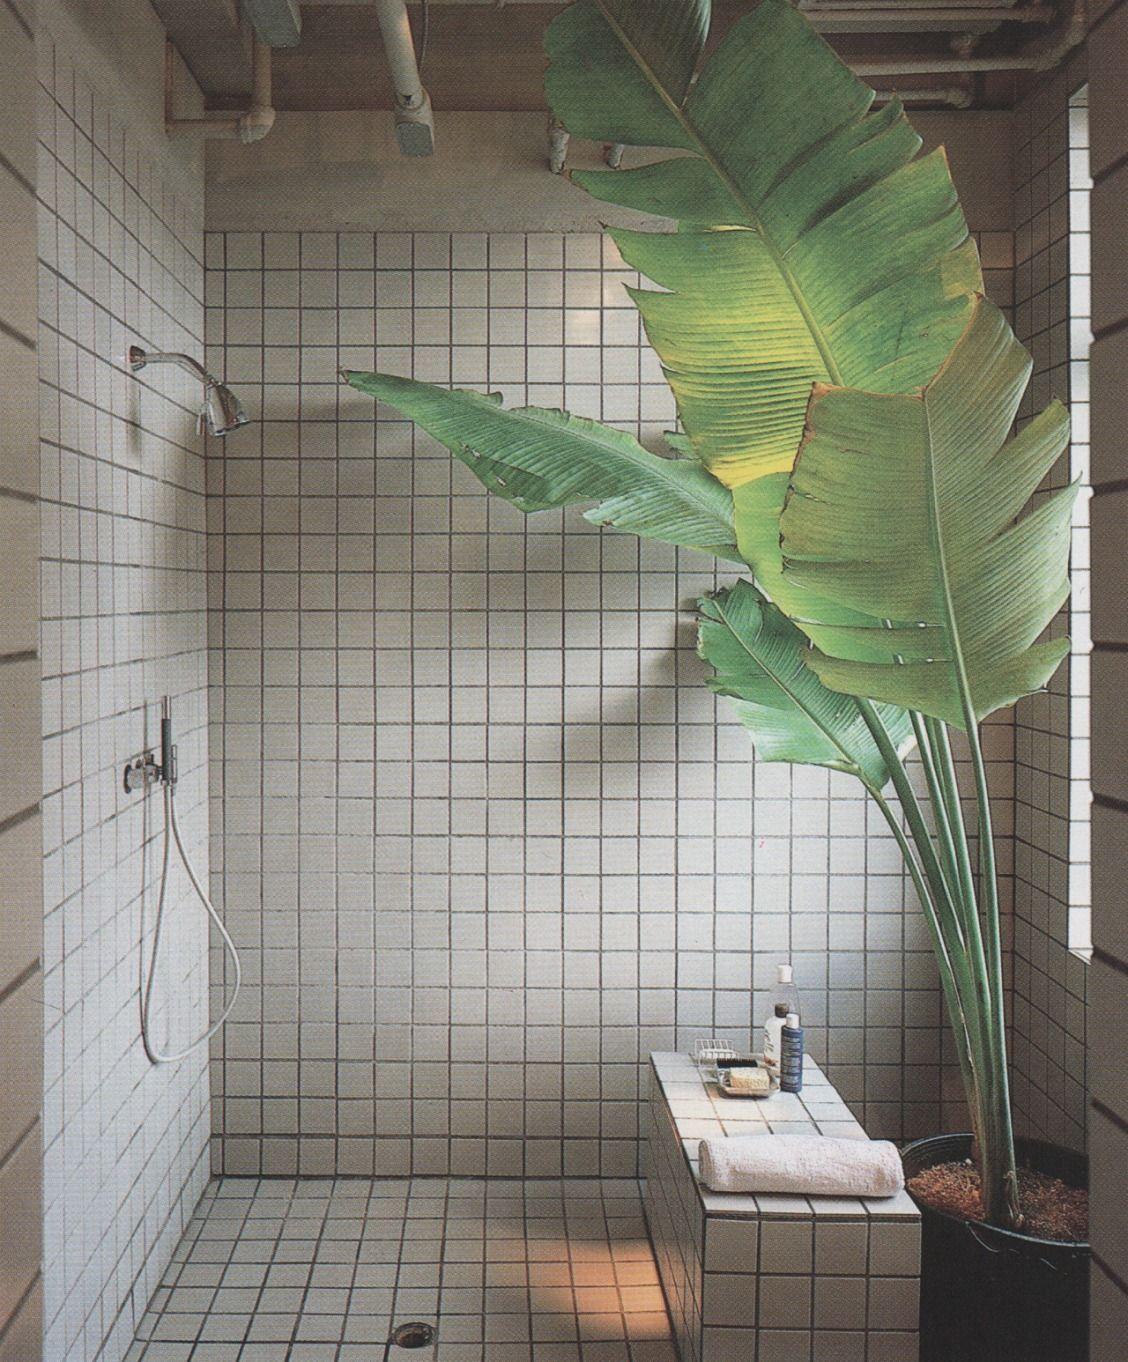 tegels | Huis | Pinterest - Tegels, Badkamer en Interieur